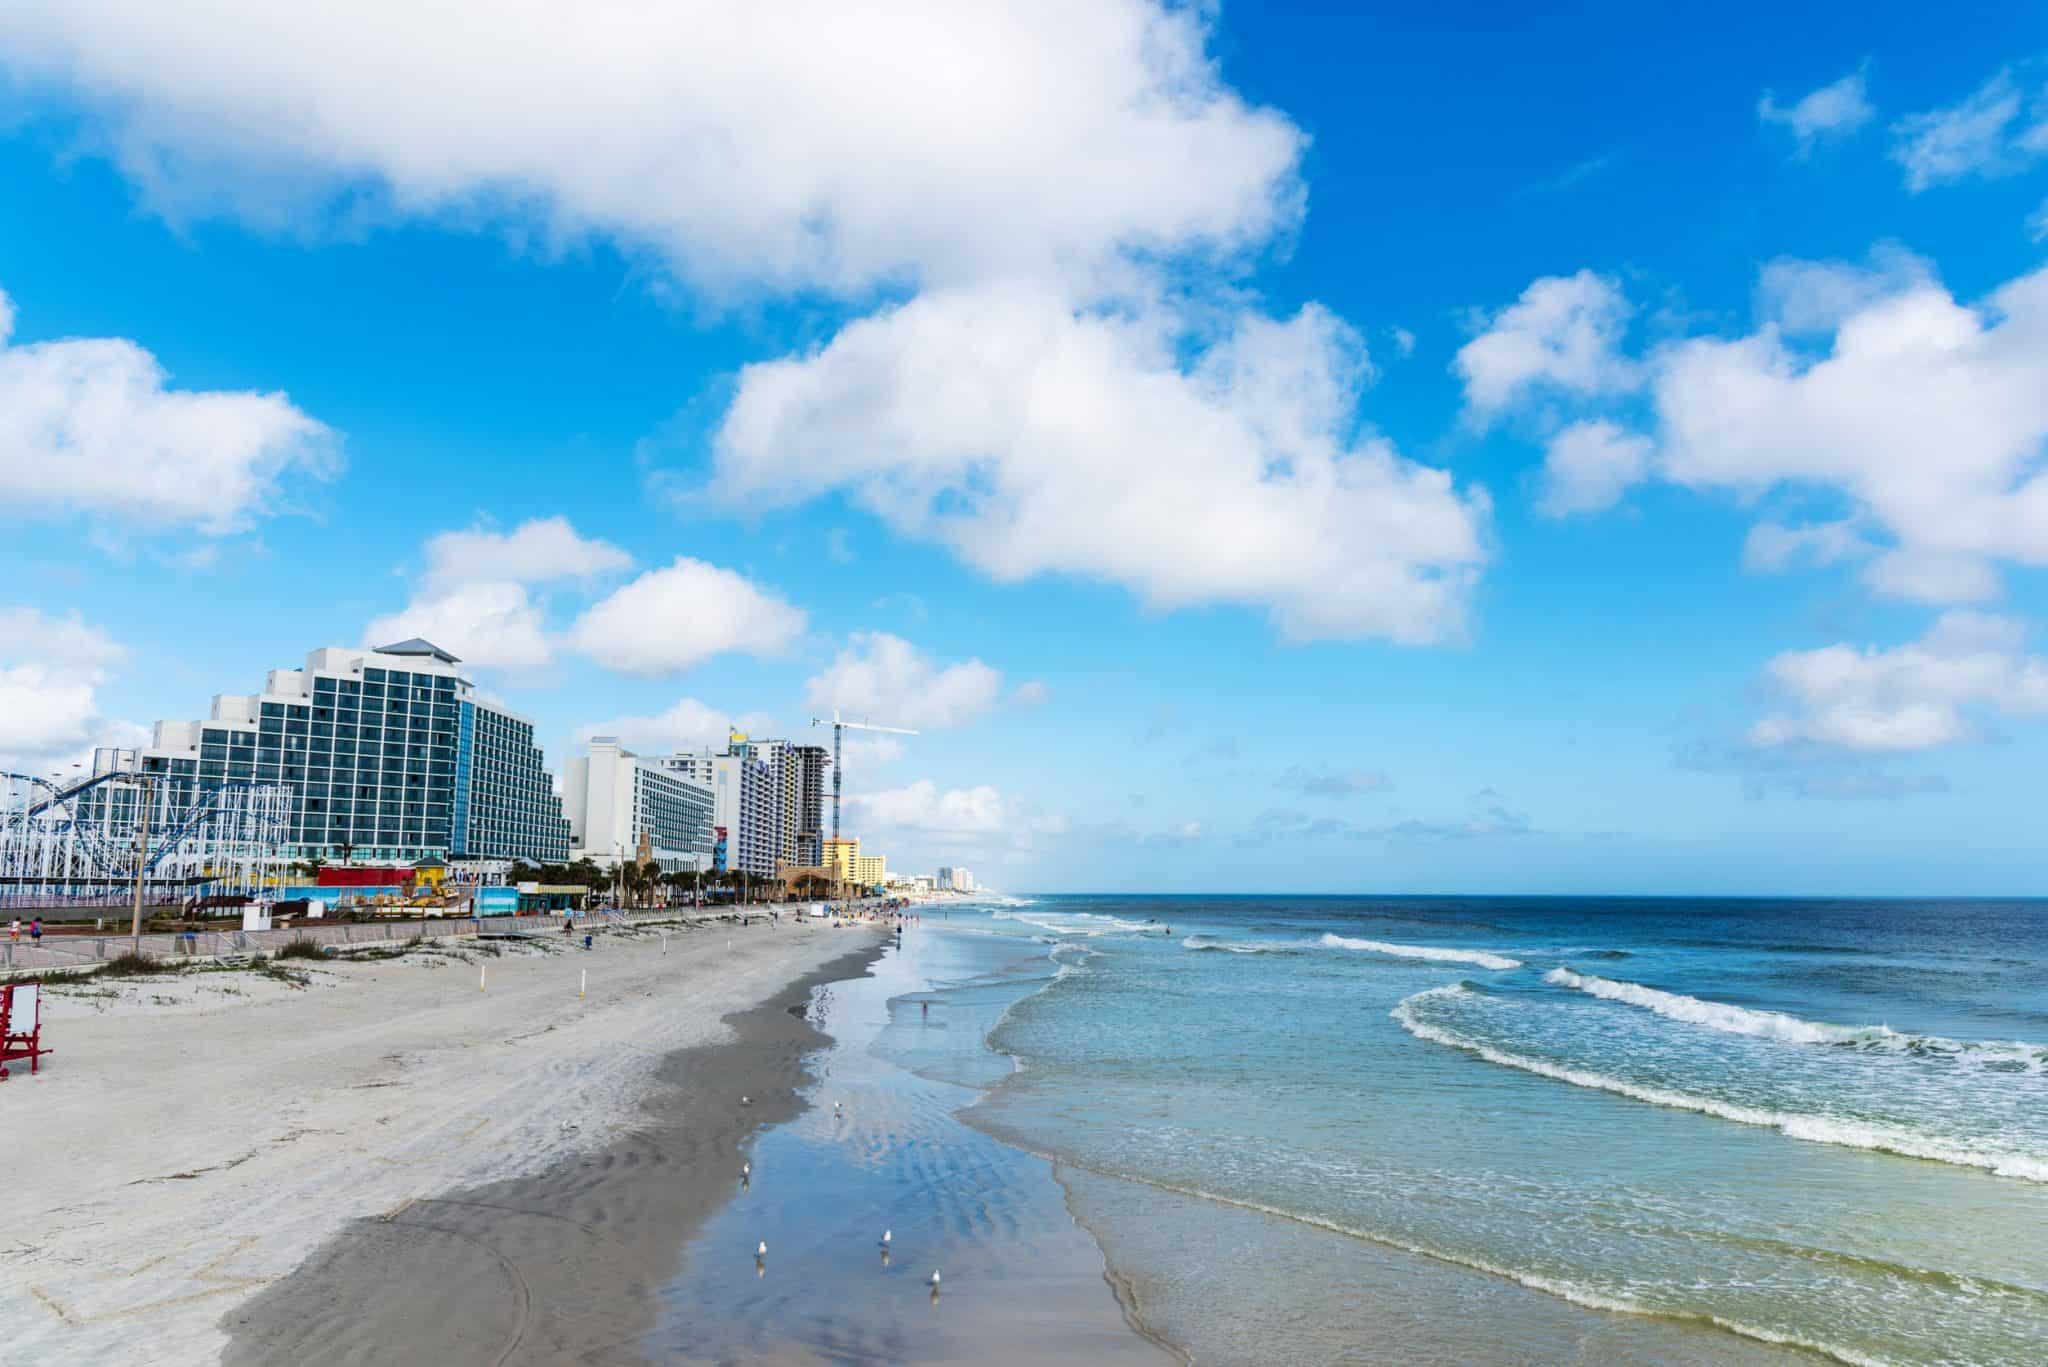 daytona-beach-2048x1367